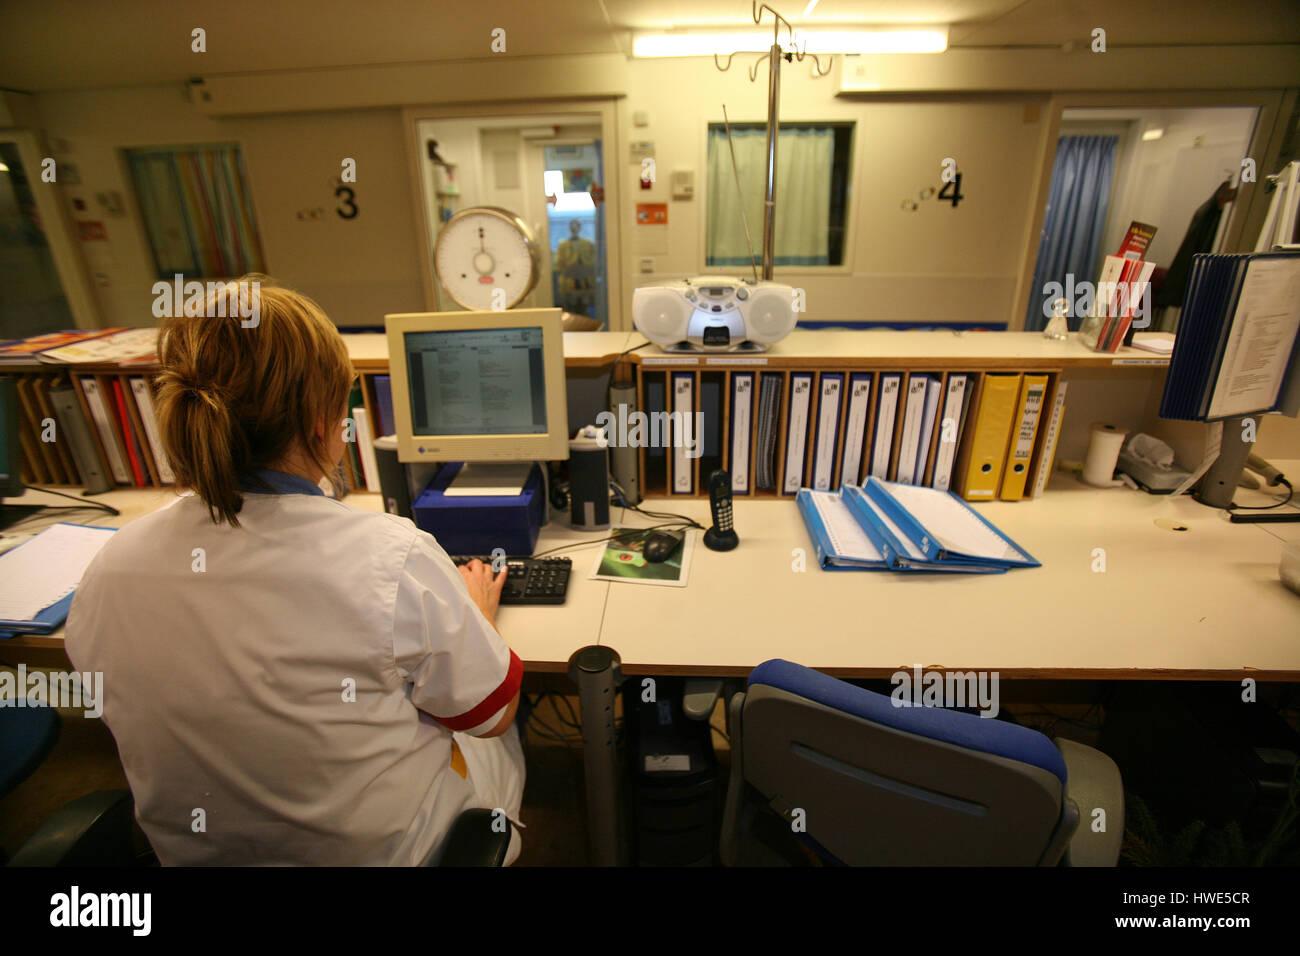 Nursing care at the leiden university hospital Stock Photo